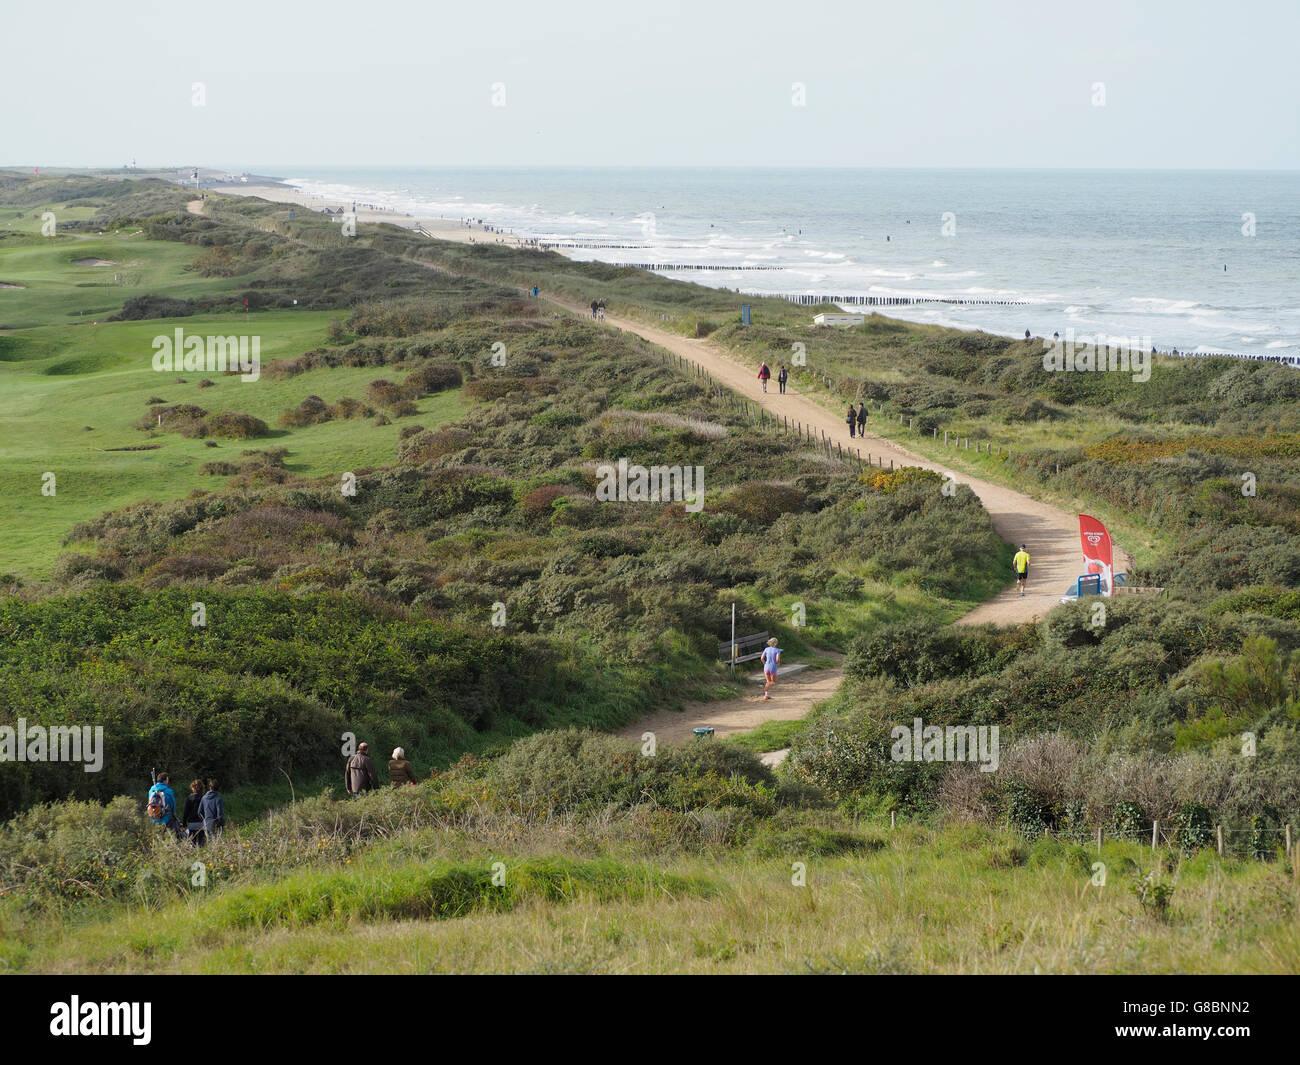 the Dutch North Sea coast near Domburg, Zeeland province - Stock Image